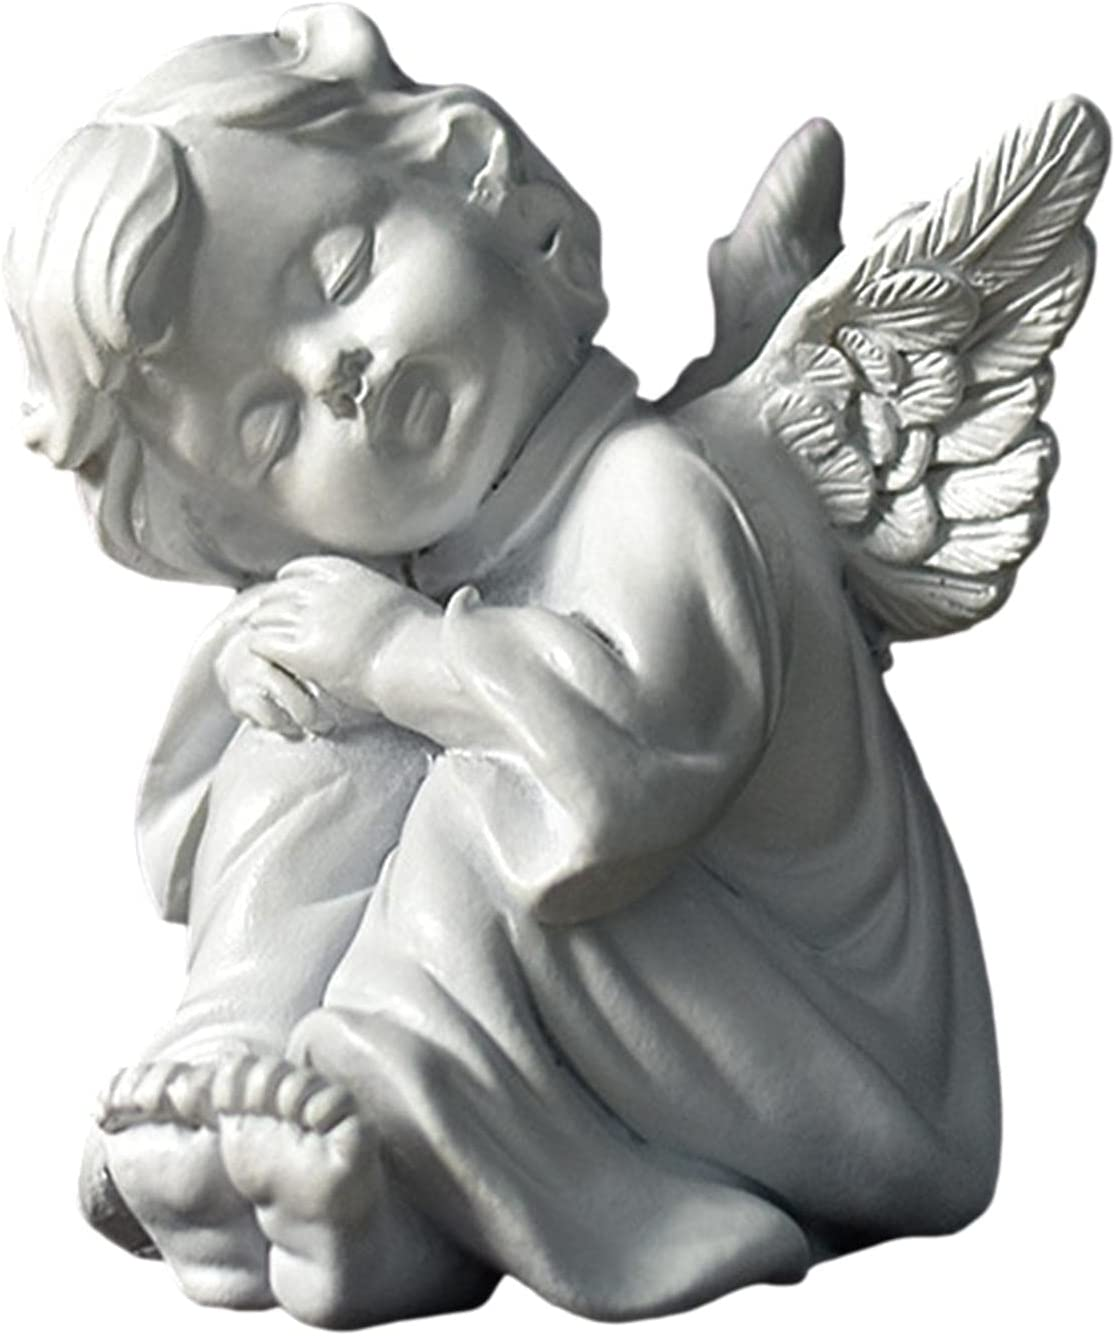 Napping Angel Resin Figurines, Cute Cartoon Angel Decoration, Table Napping Angel Decoration, Creative Desktop Resin Room Decor, Angel Statue Resin Decor Table Accessories